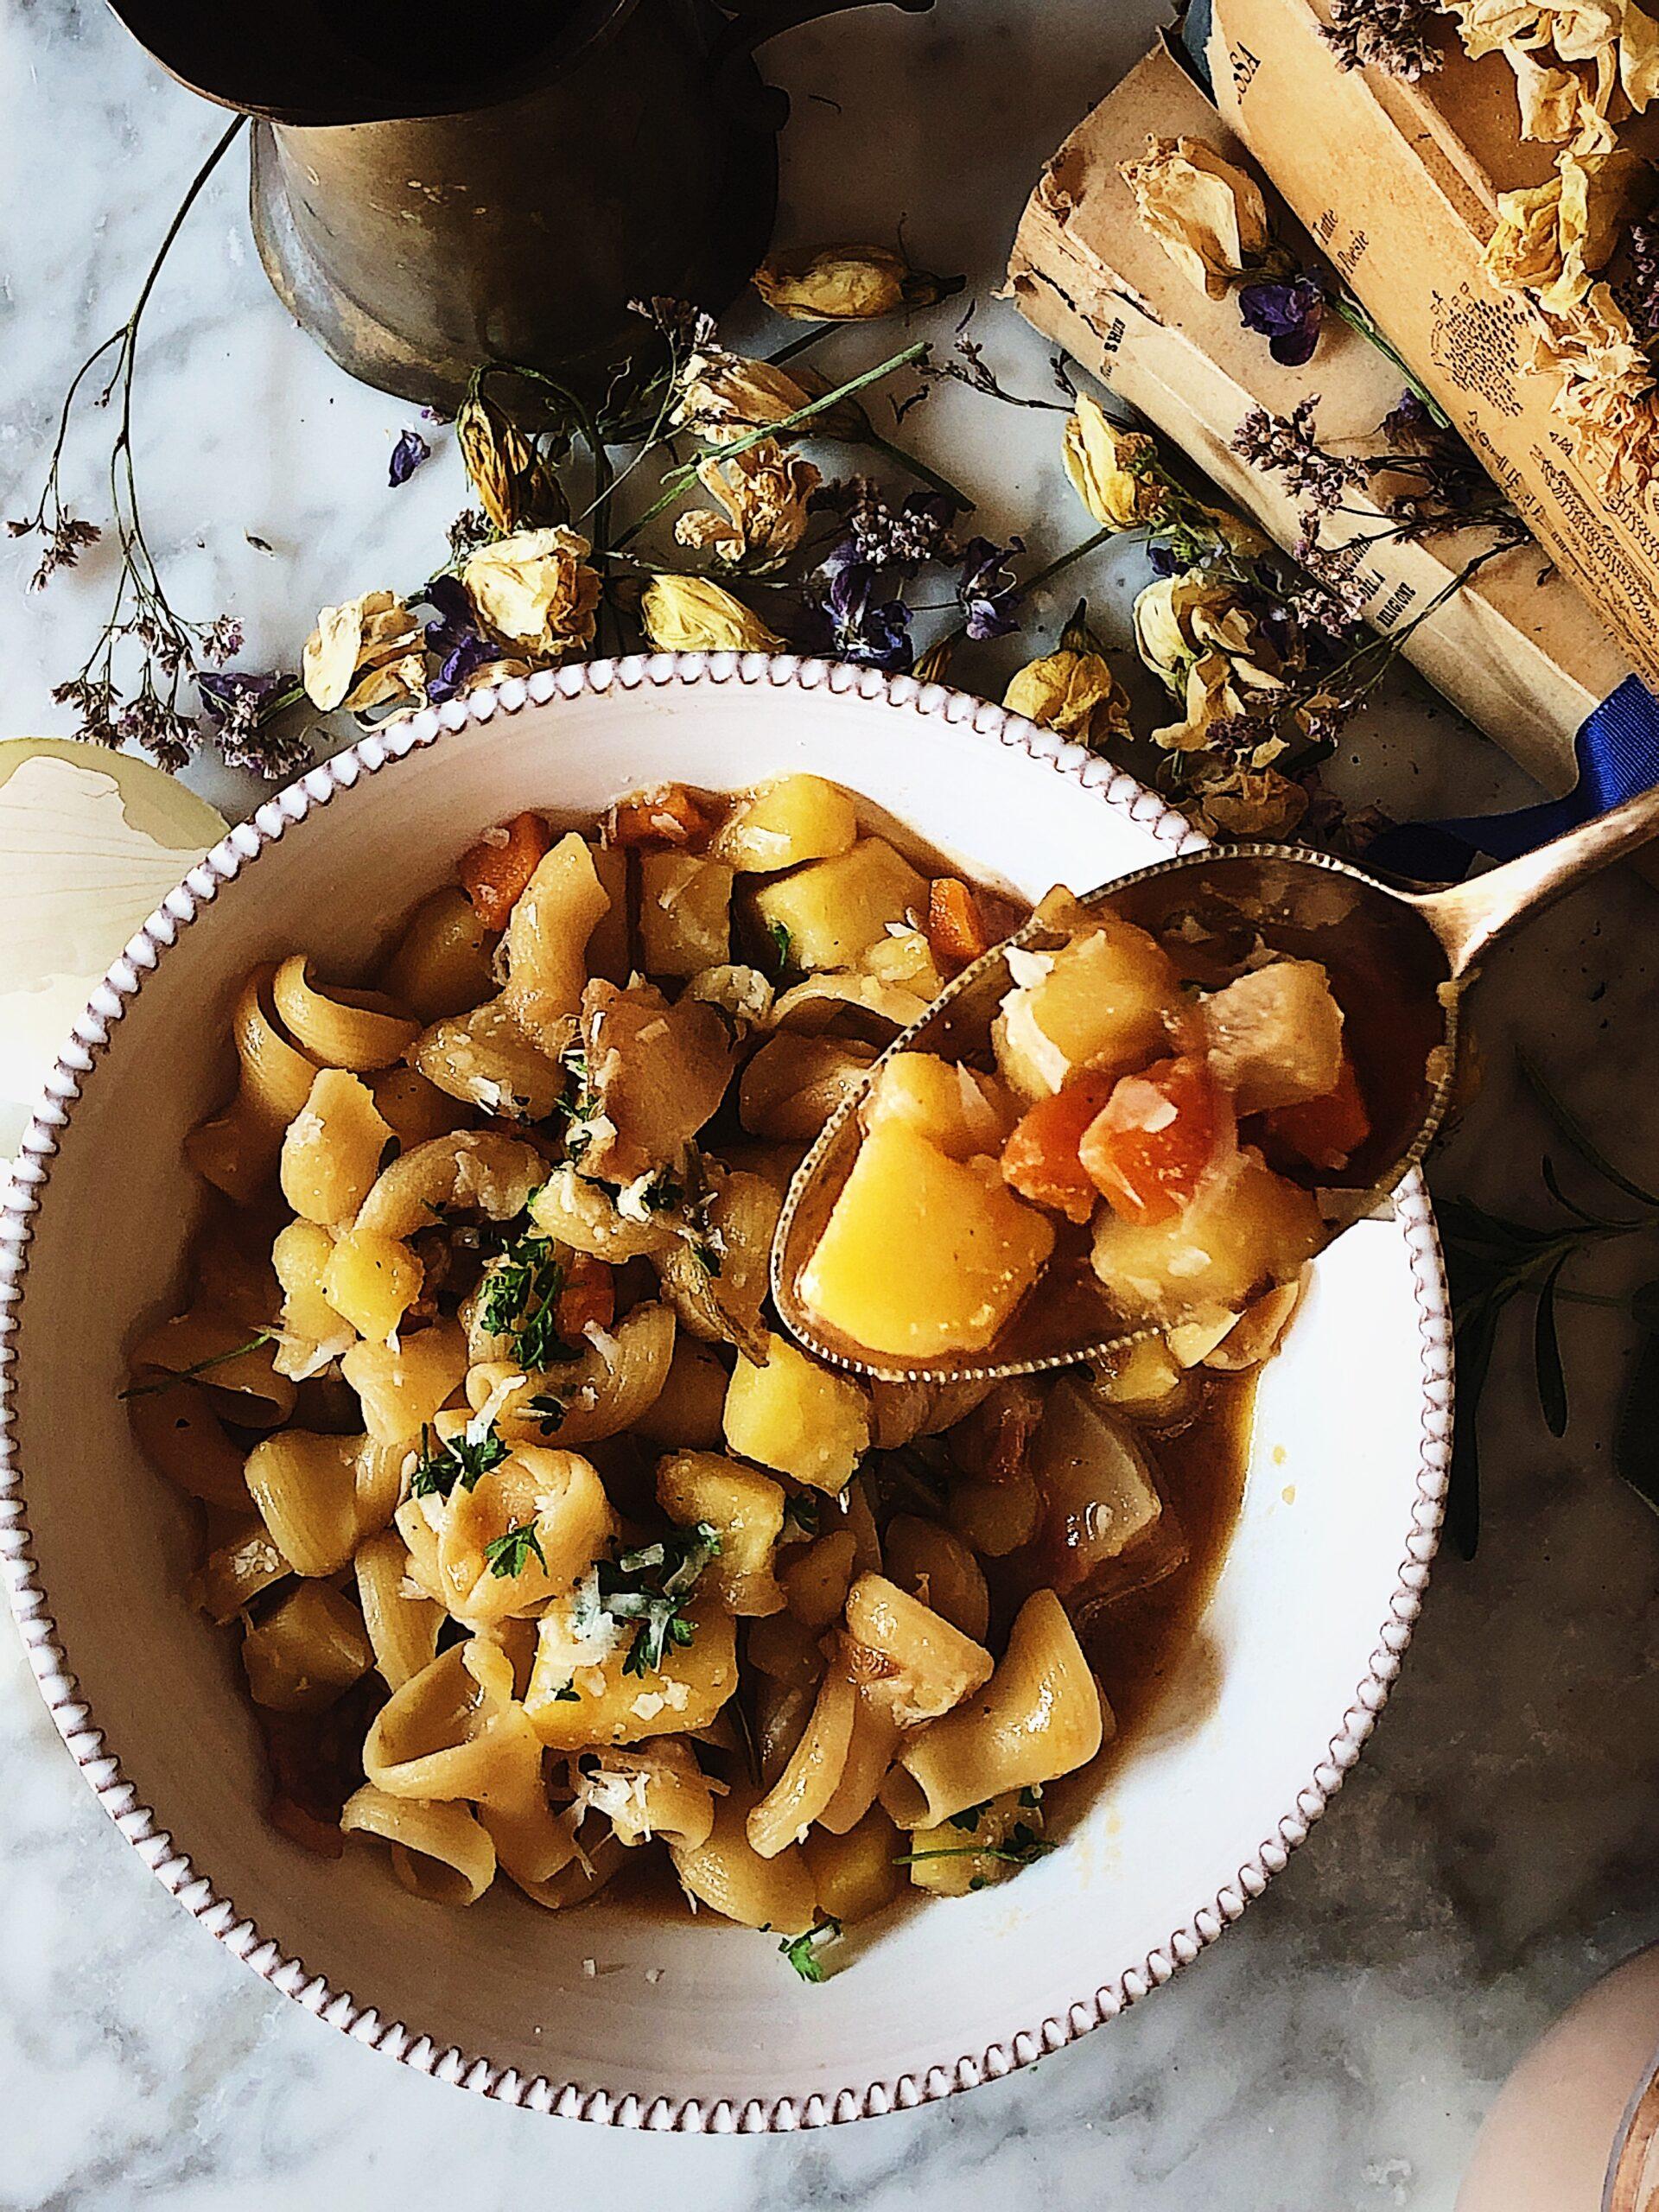 Italian food magazine